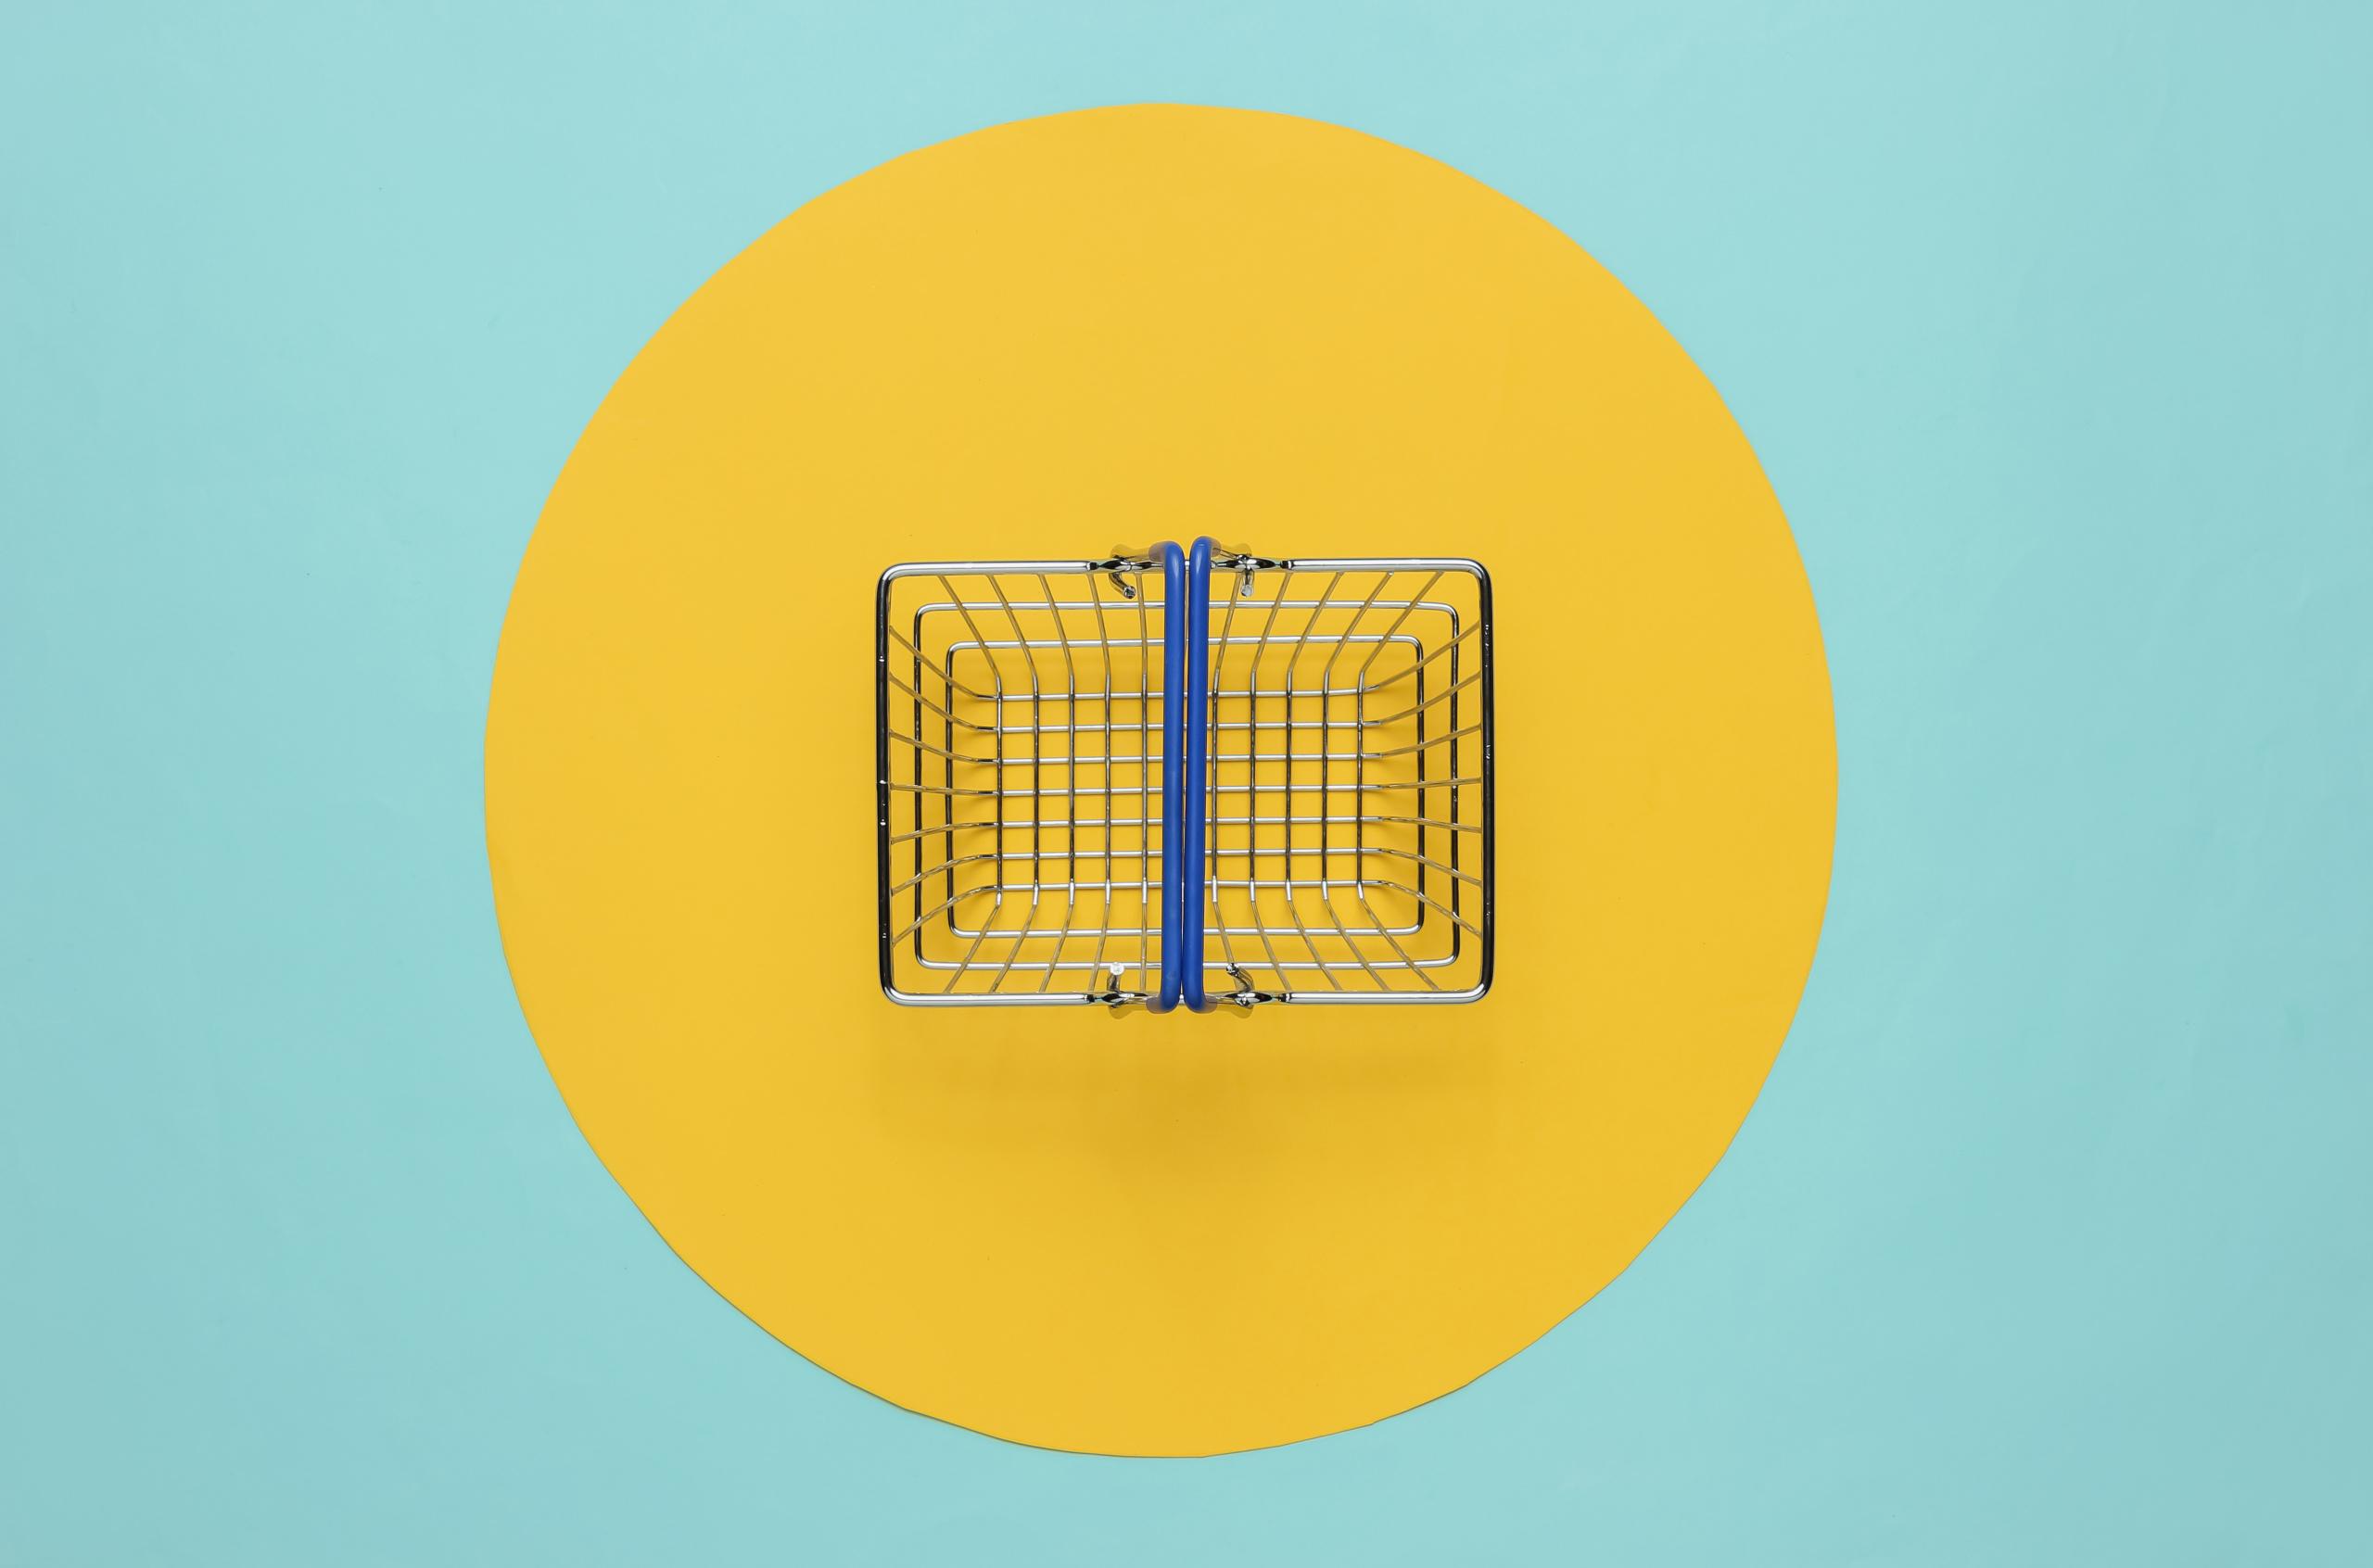 Mini-shopping-basket-on-blue-background-with-yellow-circle-scaled